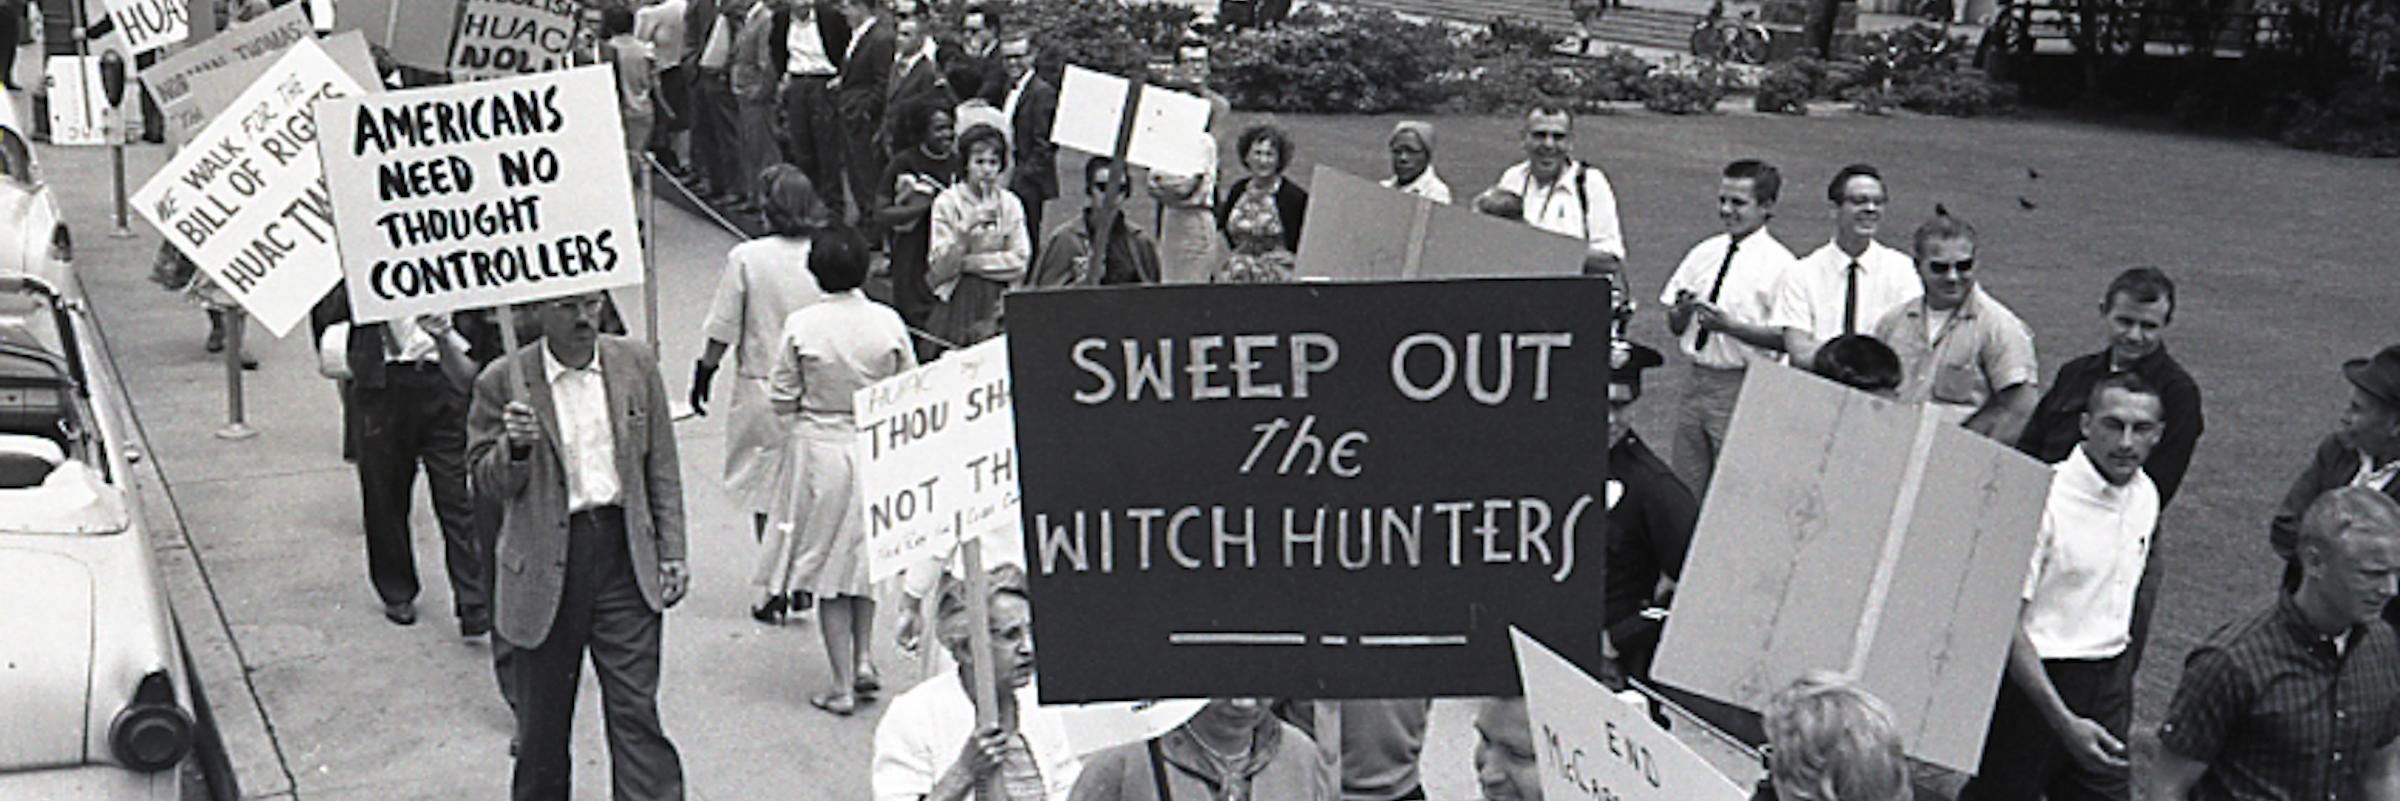 1962, Los Angeles, CA, demonstration to Abolish HUAC.